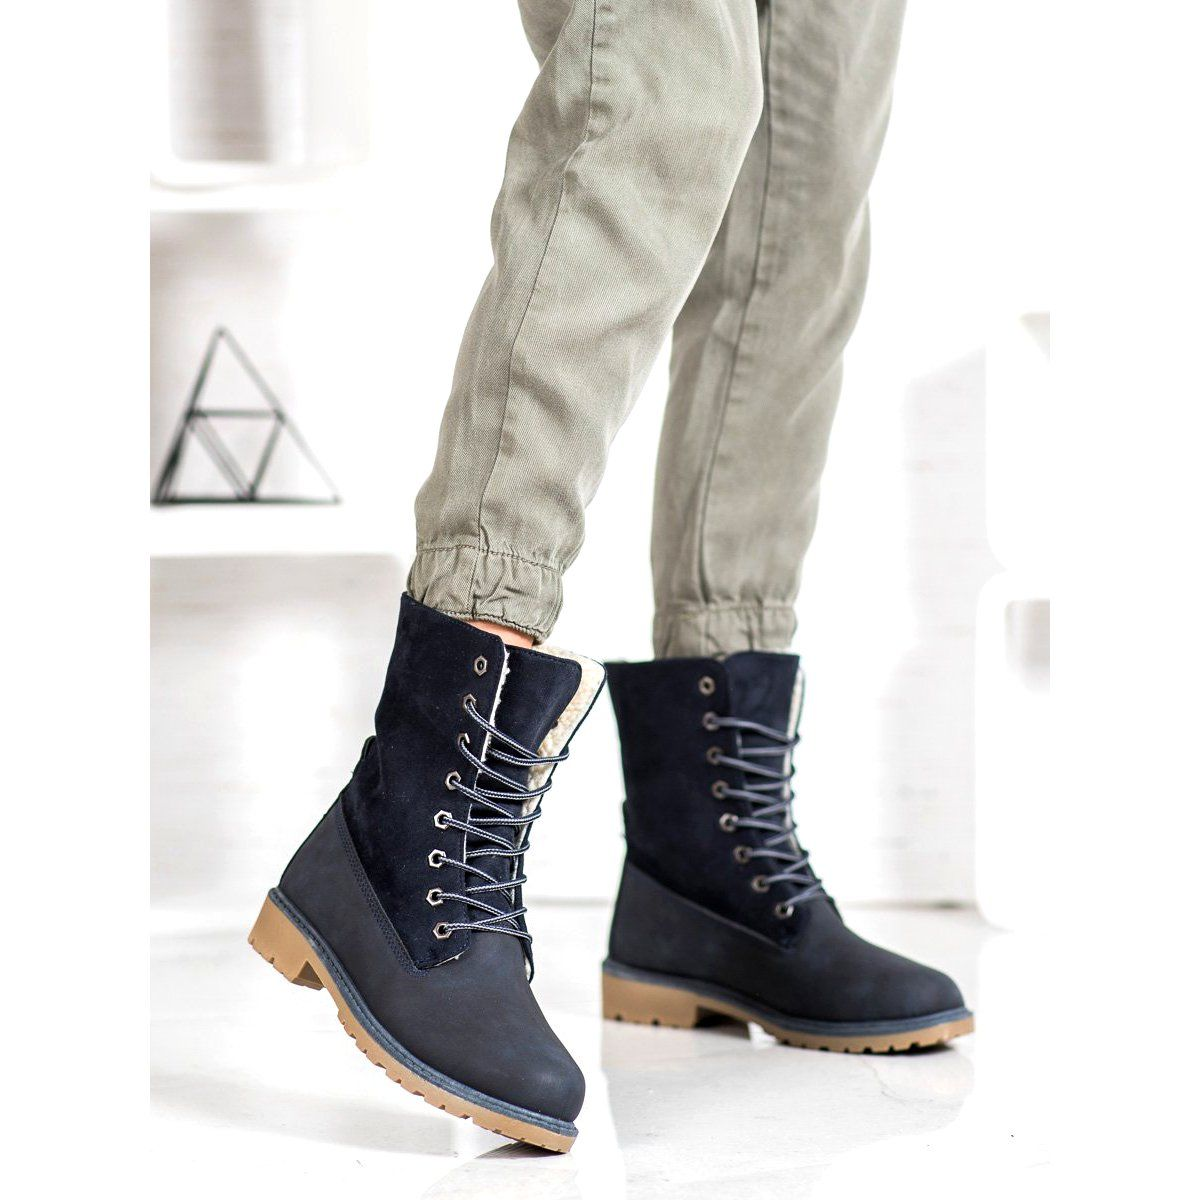 Super Me Sznurowane Botki Niebieskie Black Boots Boots Black Lace Up Boots